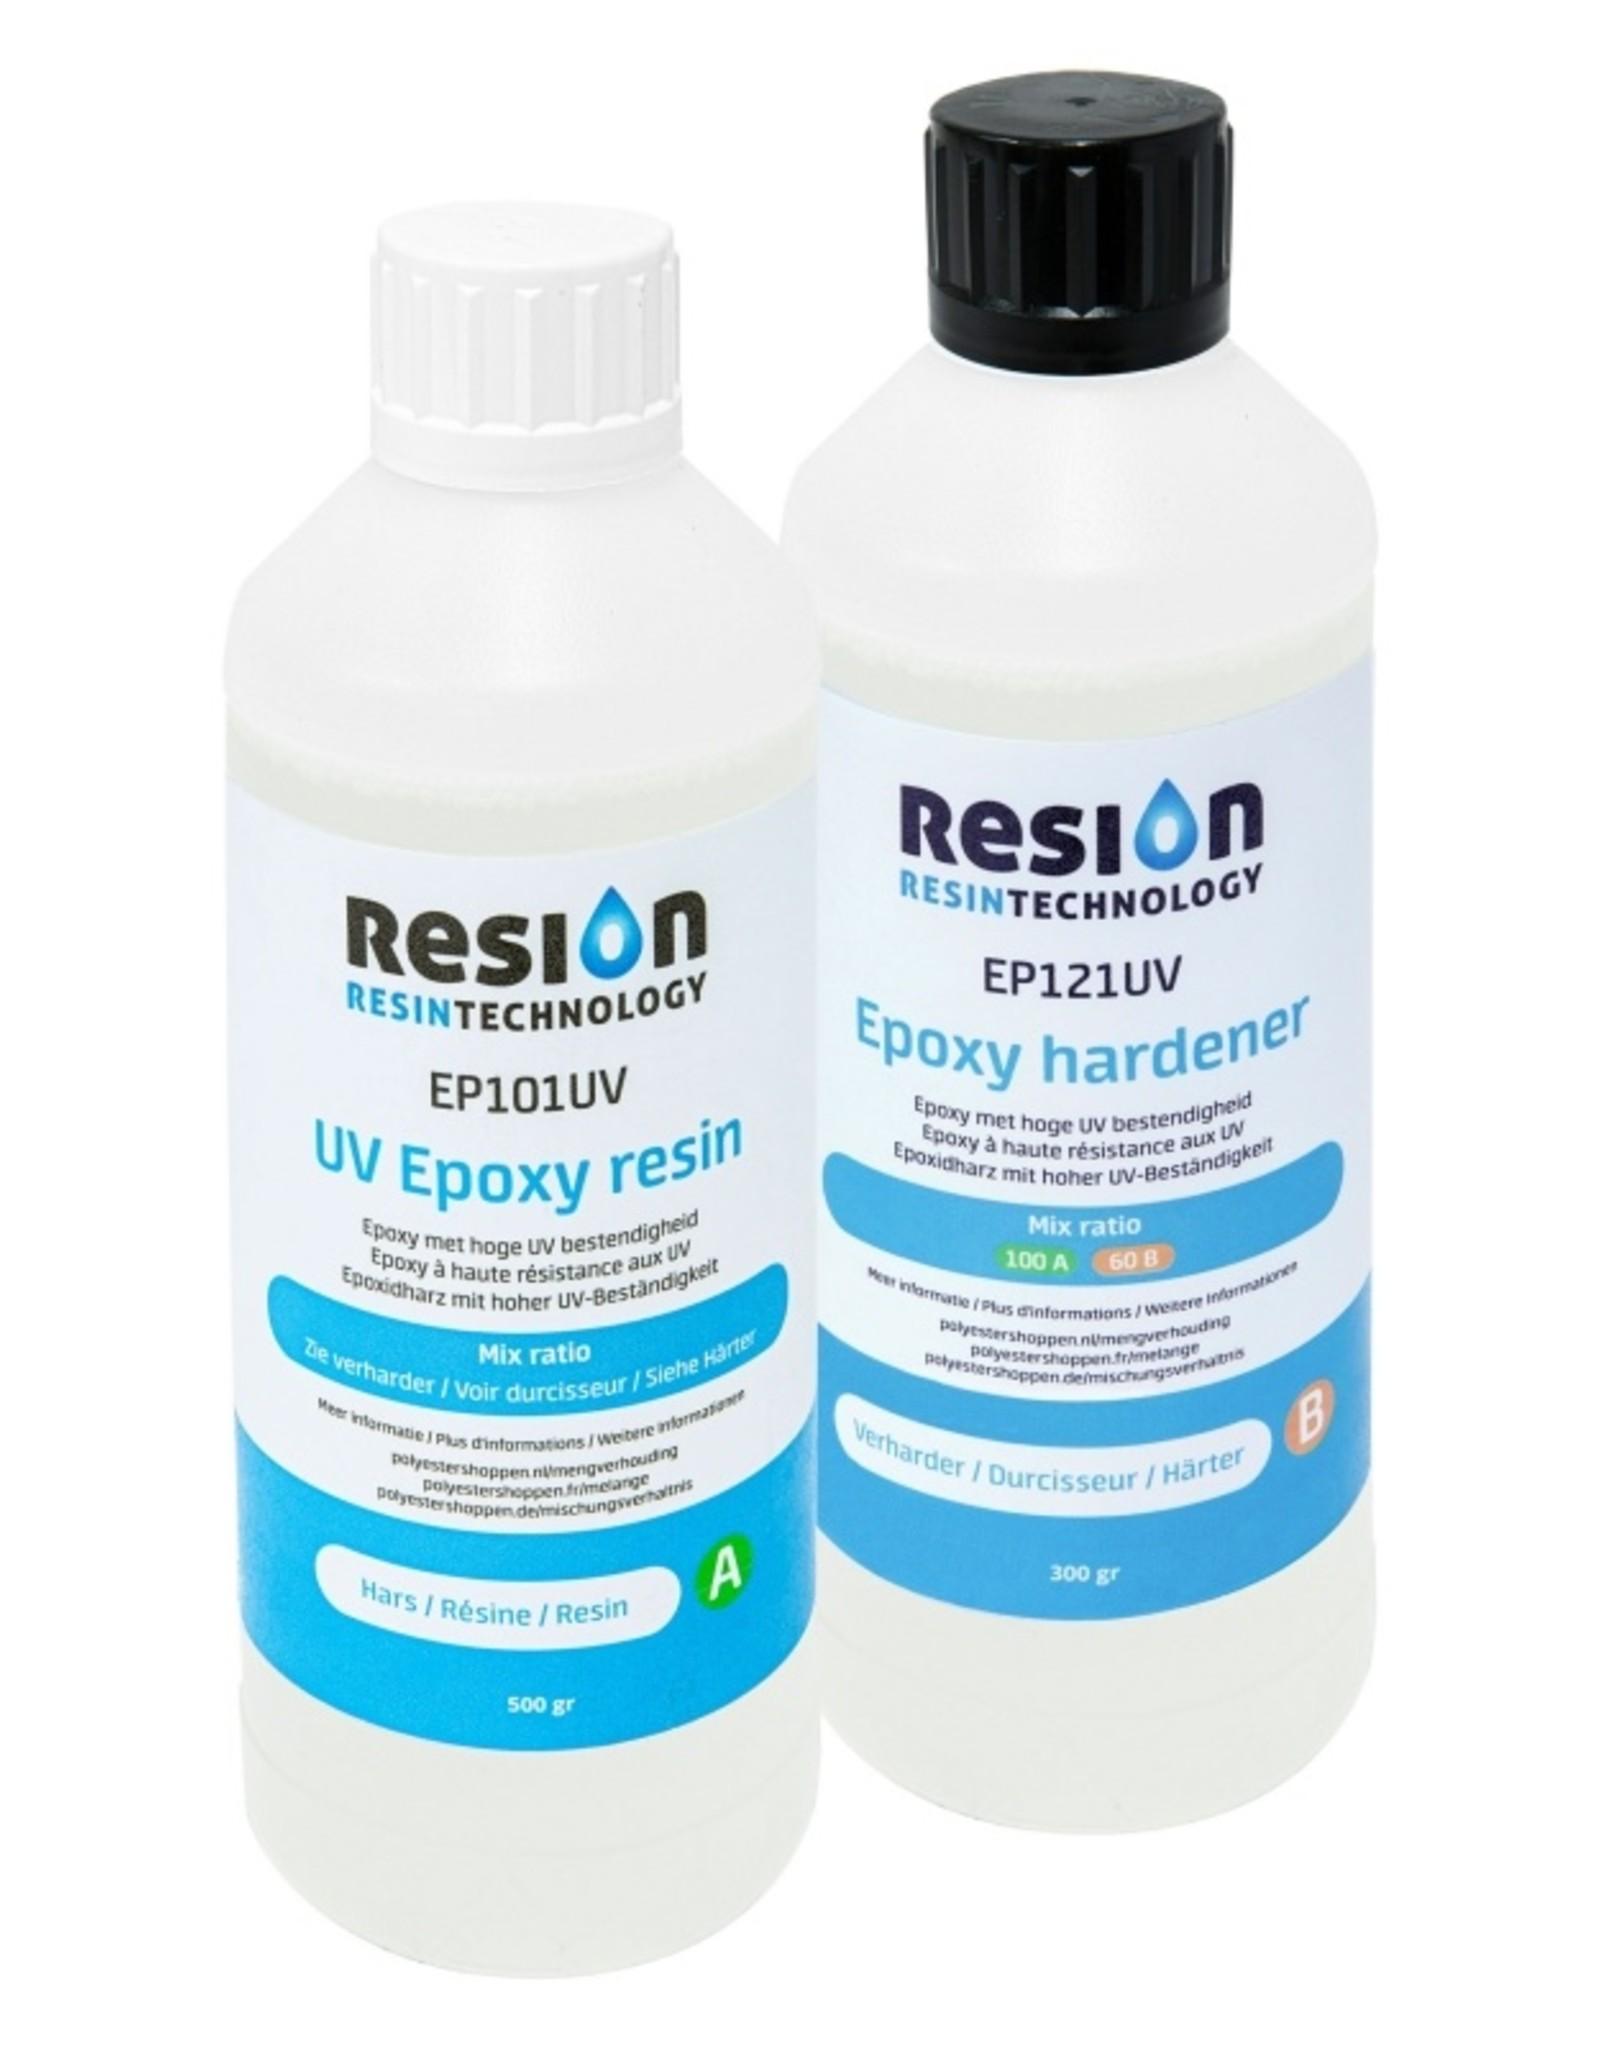 Resion Epoxy 2 componenten 800 gram EP121UV en EP101UV